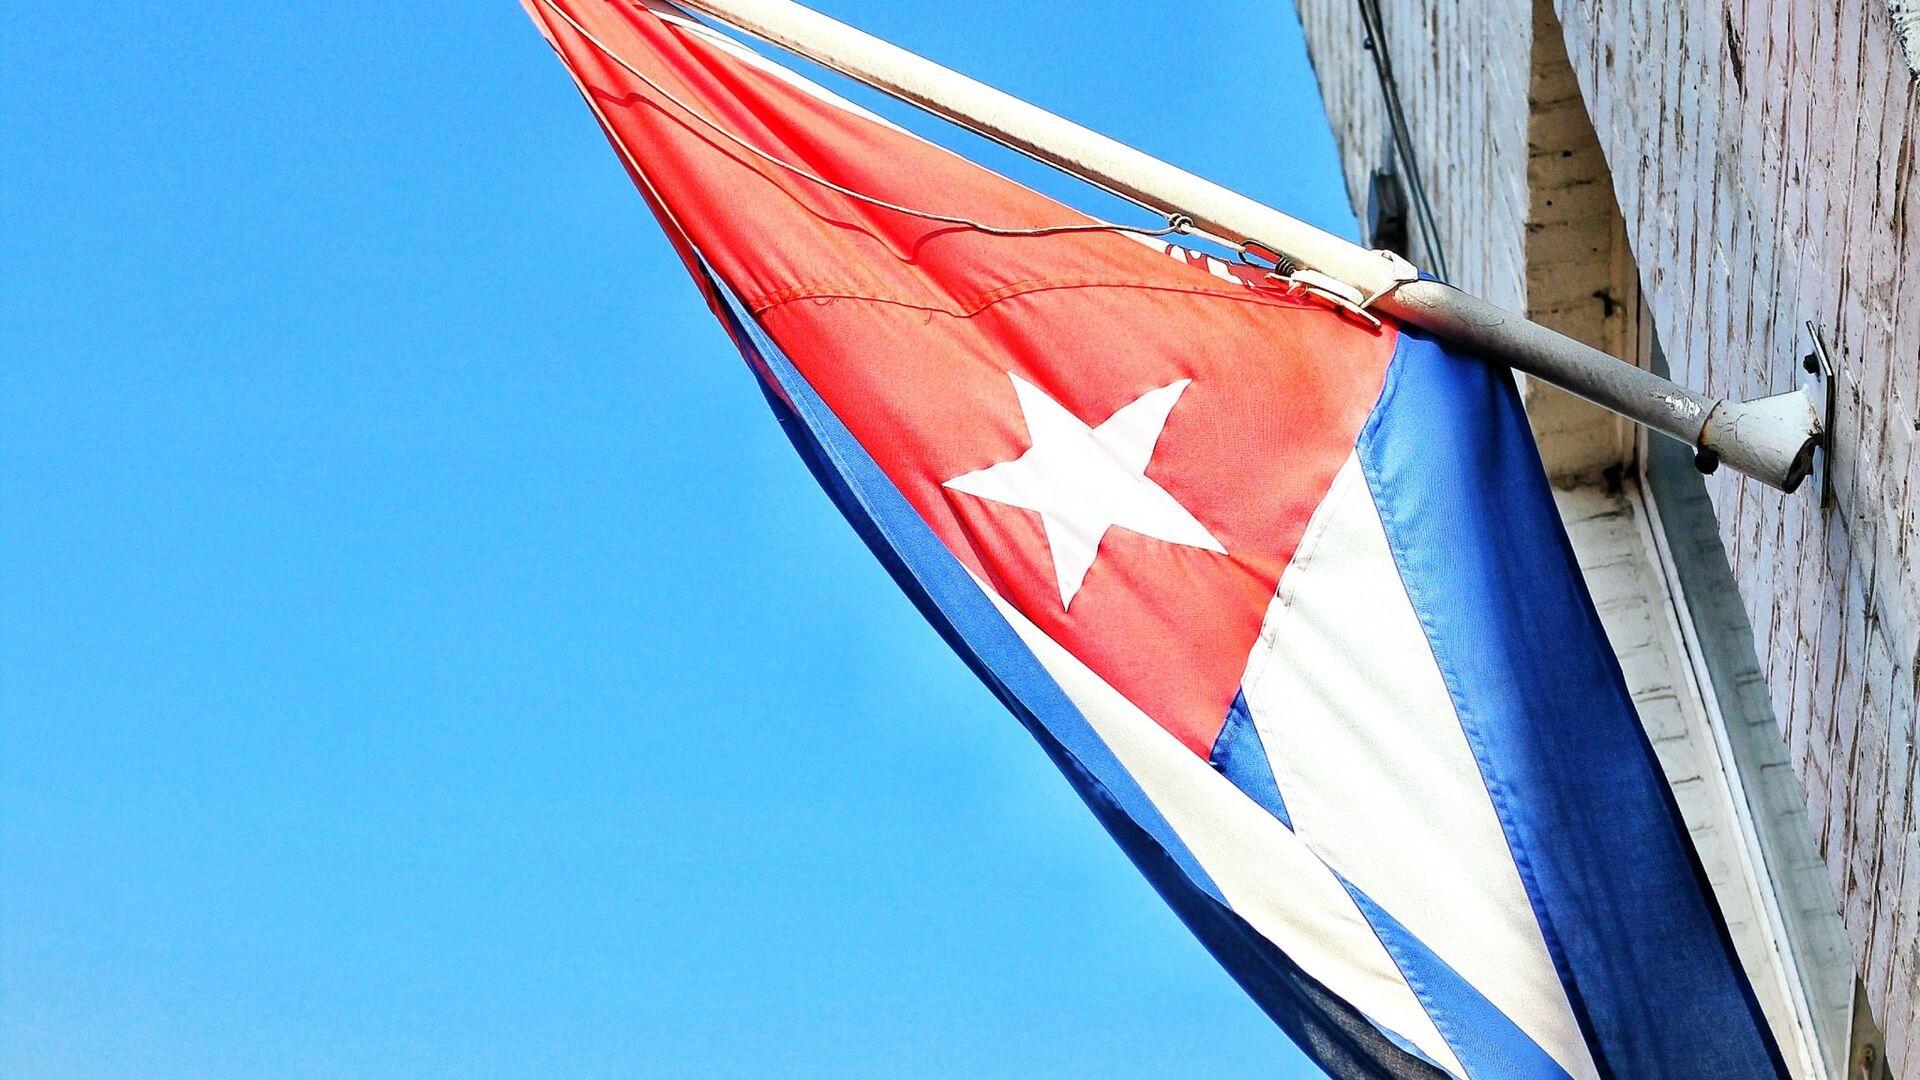 La bandera de Cuba - Sputnik Mundo, 1920, 12.07.2021